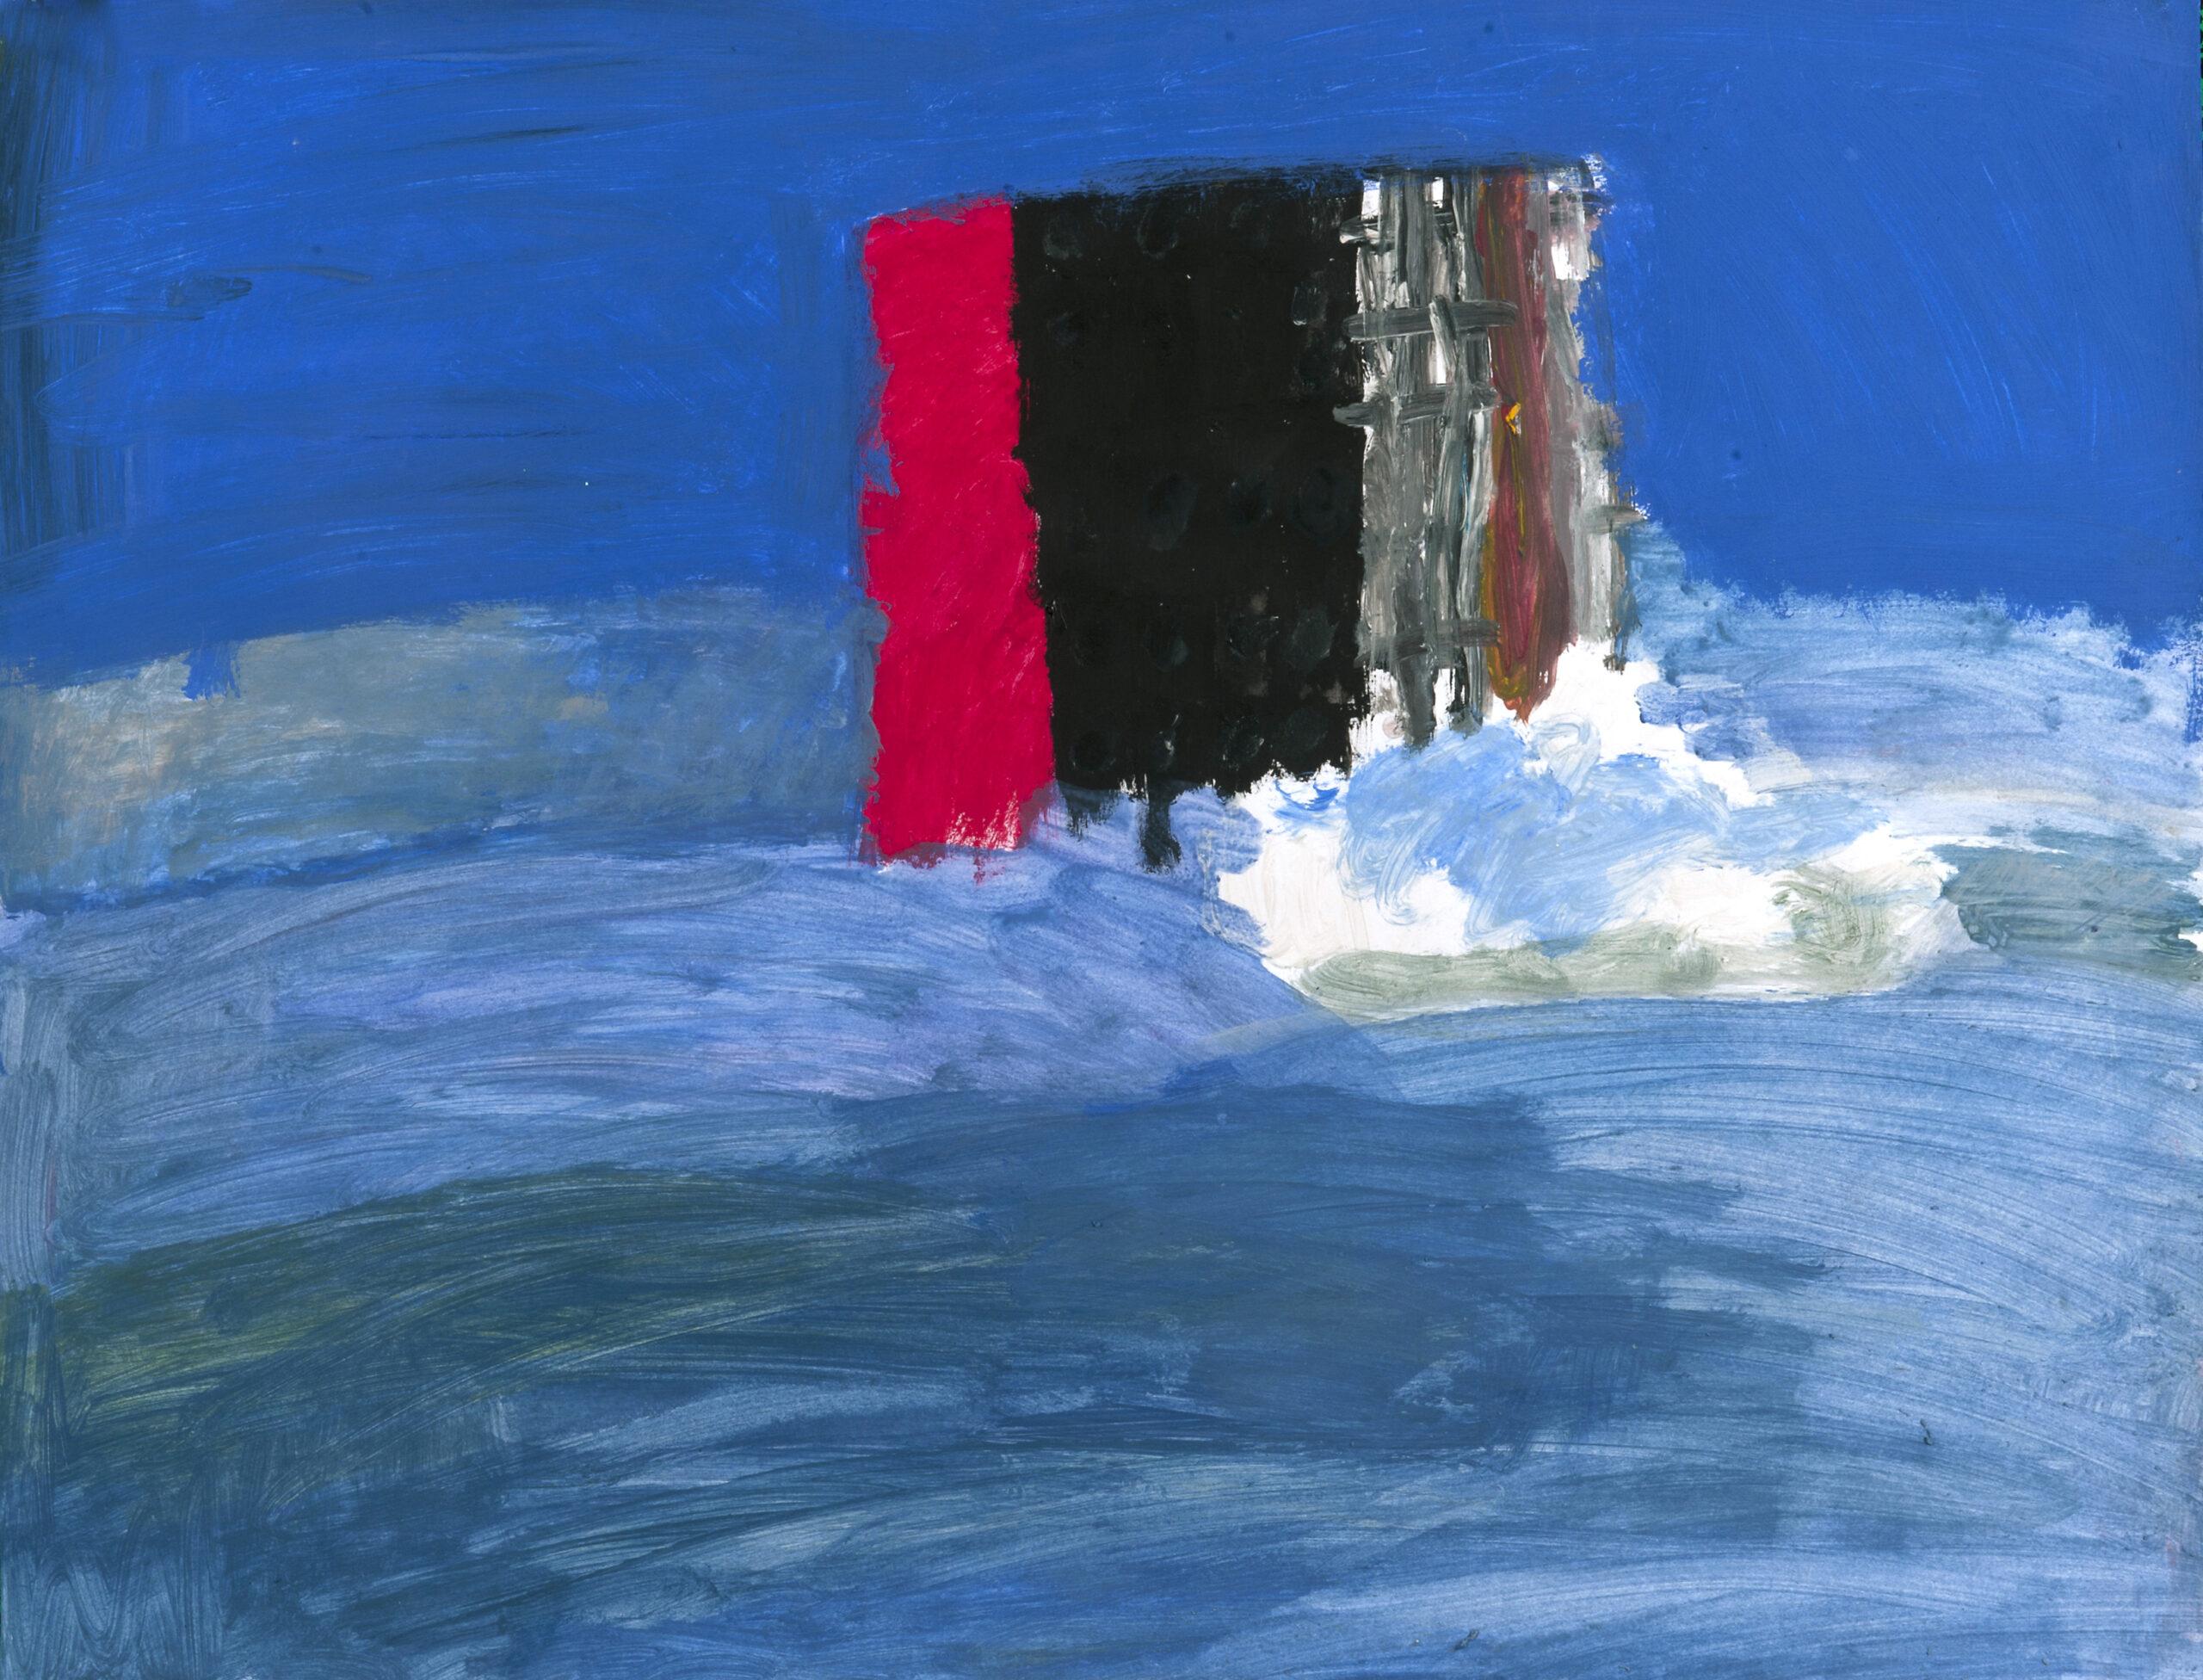 François Peeters, Série Titanic 3, 2010